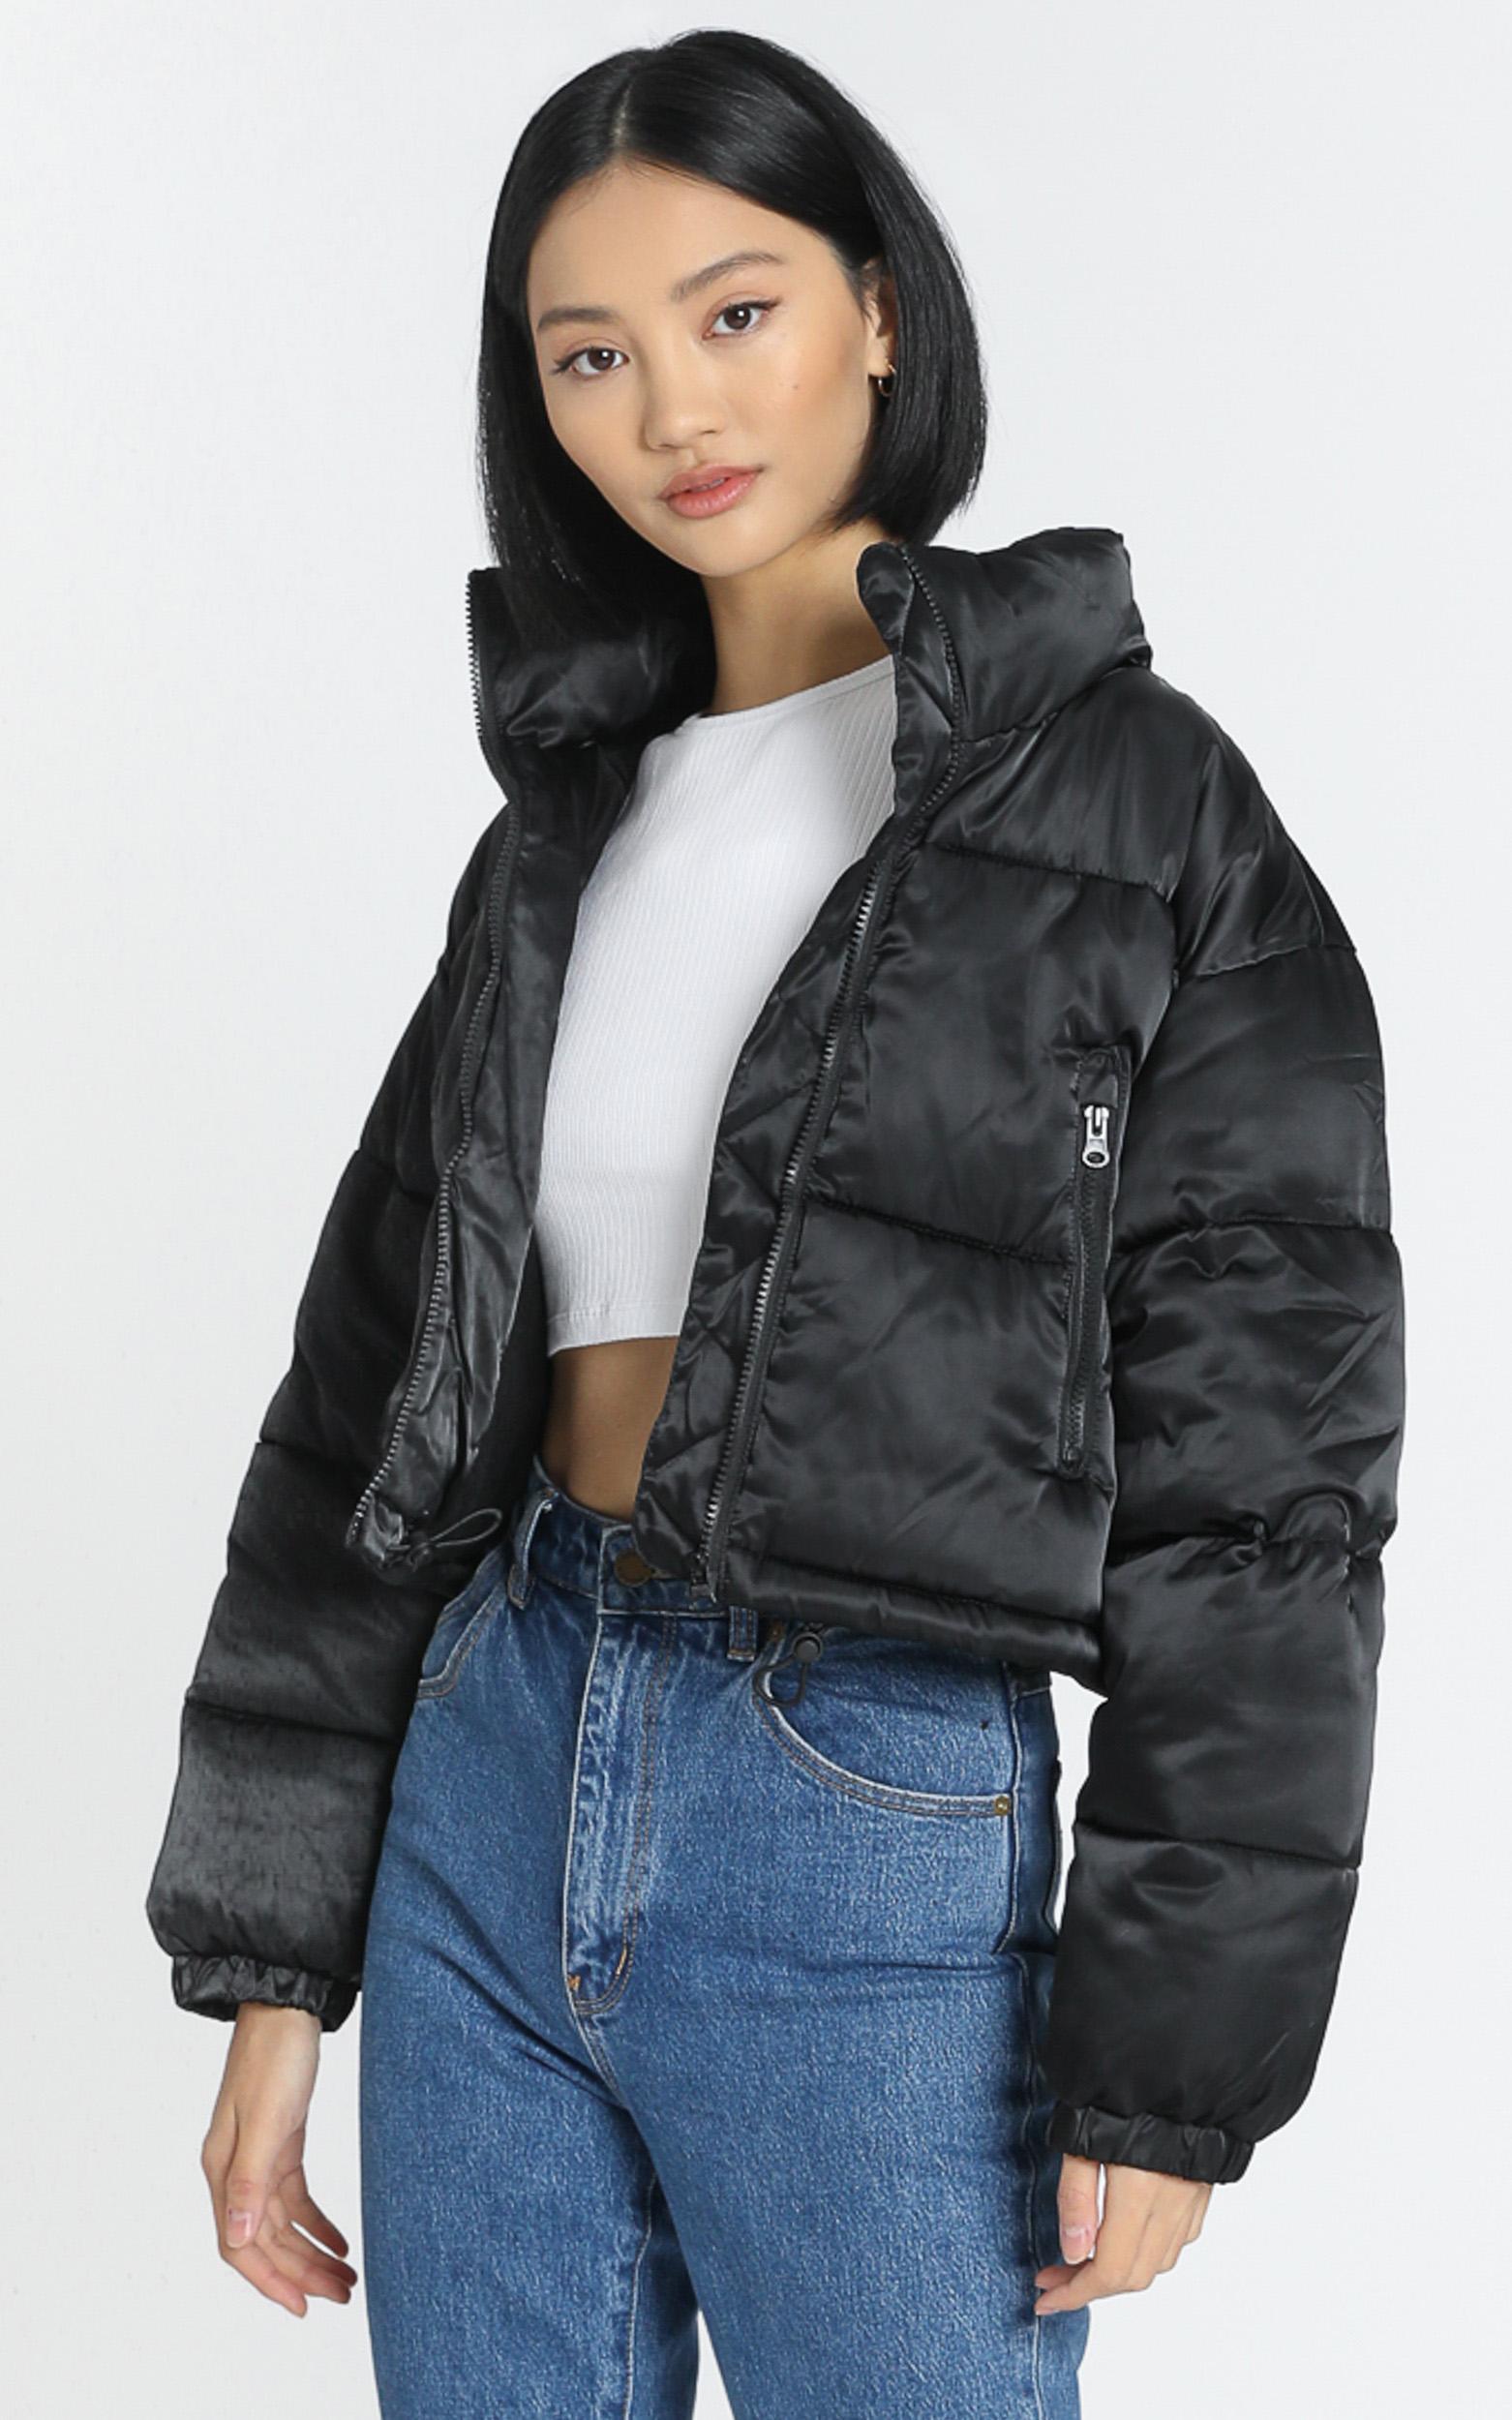 European Dream Puffer jacket in black - 8 (S), Black, hi-res image number null